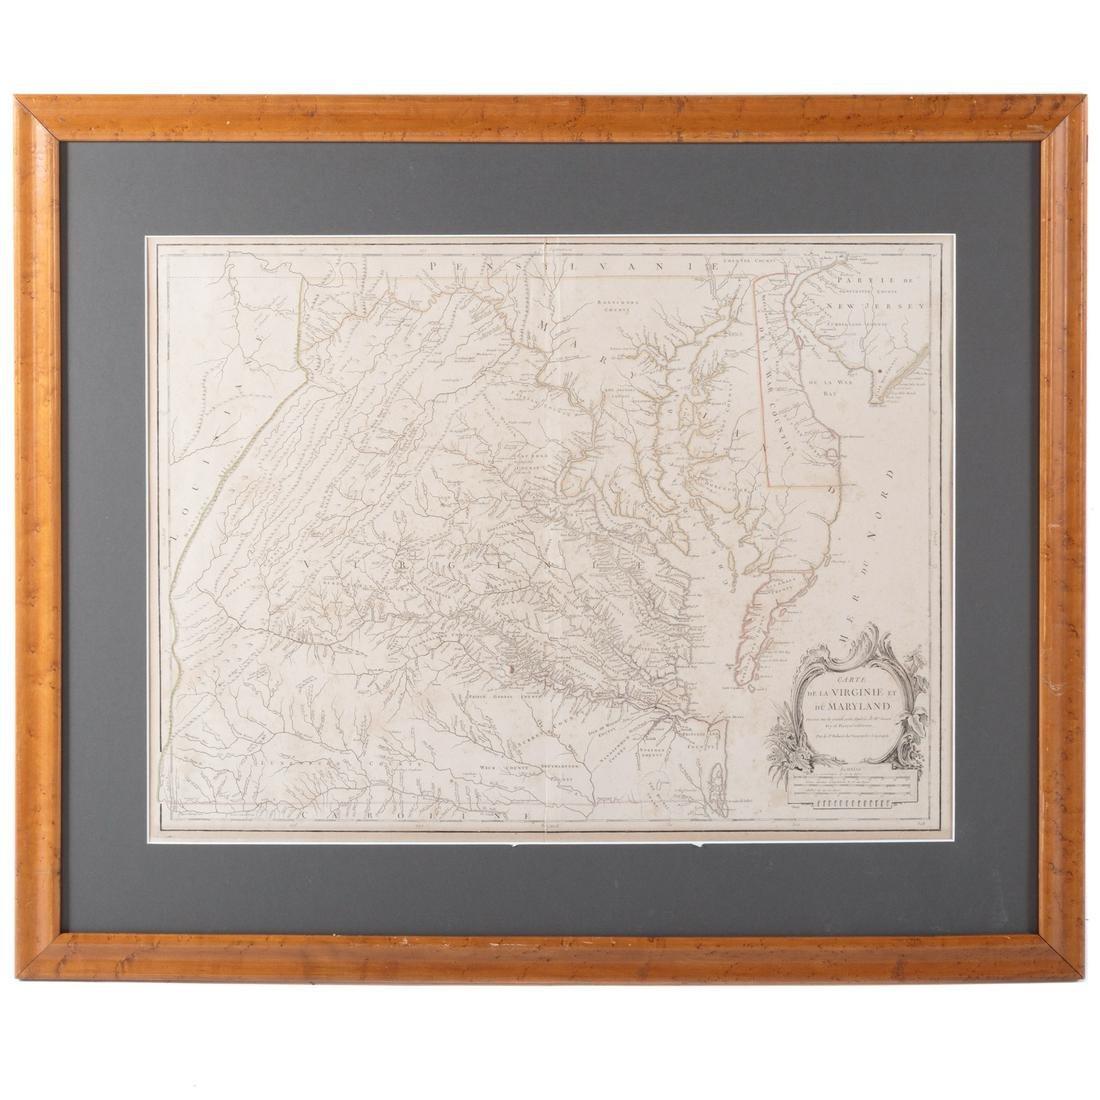 de Vaugondy. Carte de la Virginie et du Maryland